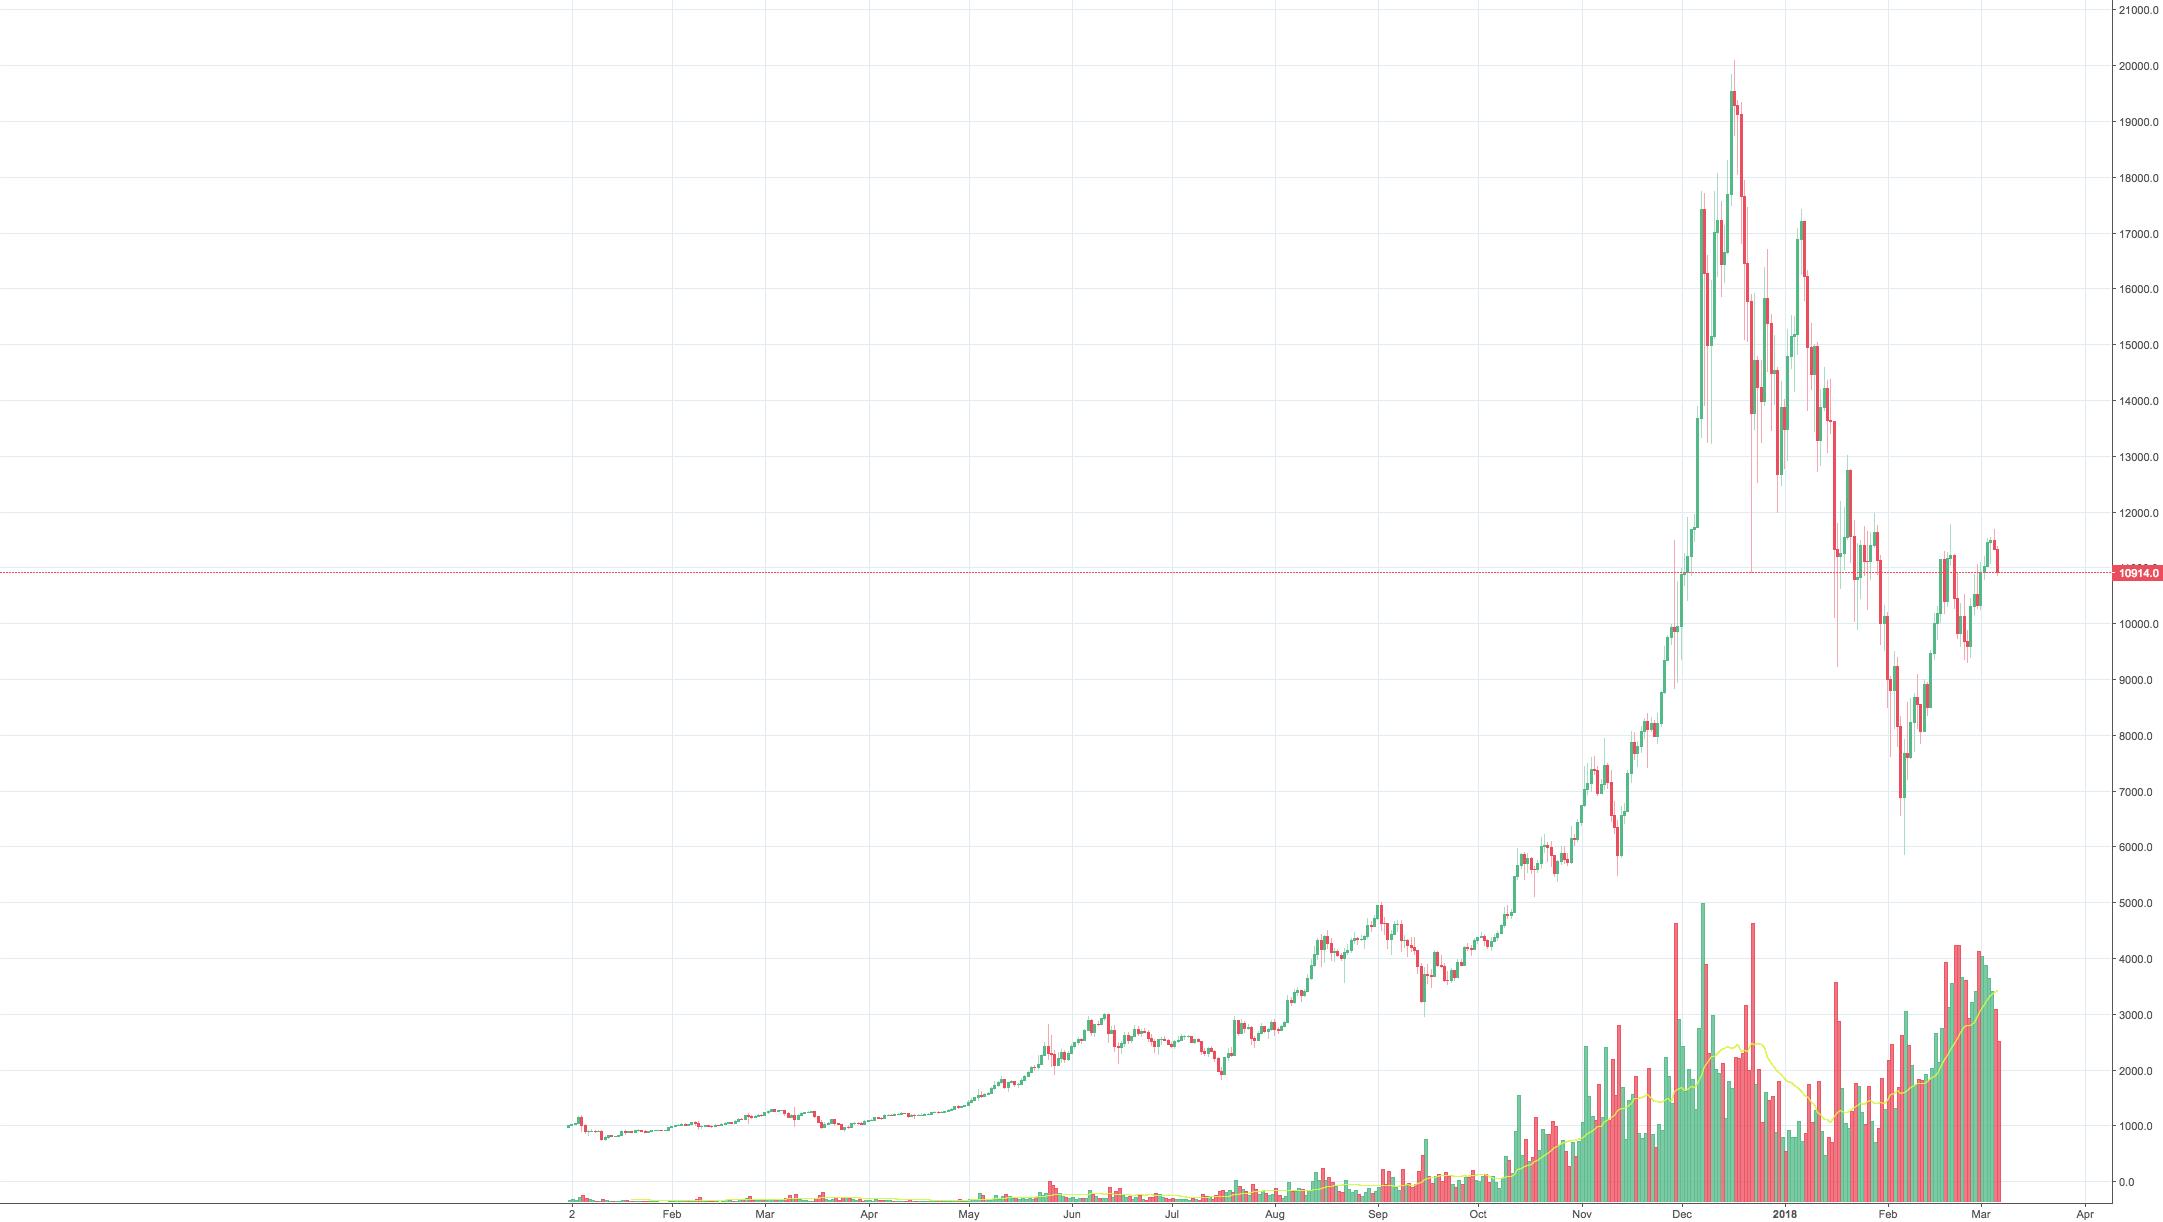 Bitmex, Bitcoin future trading, volume increased enormously !!